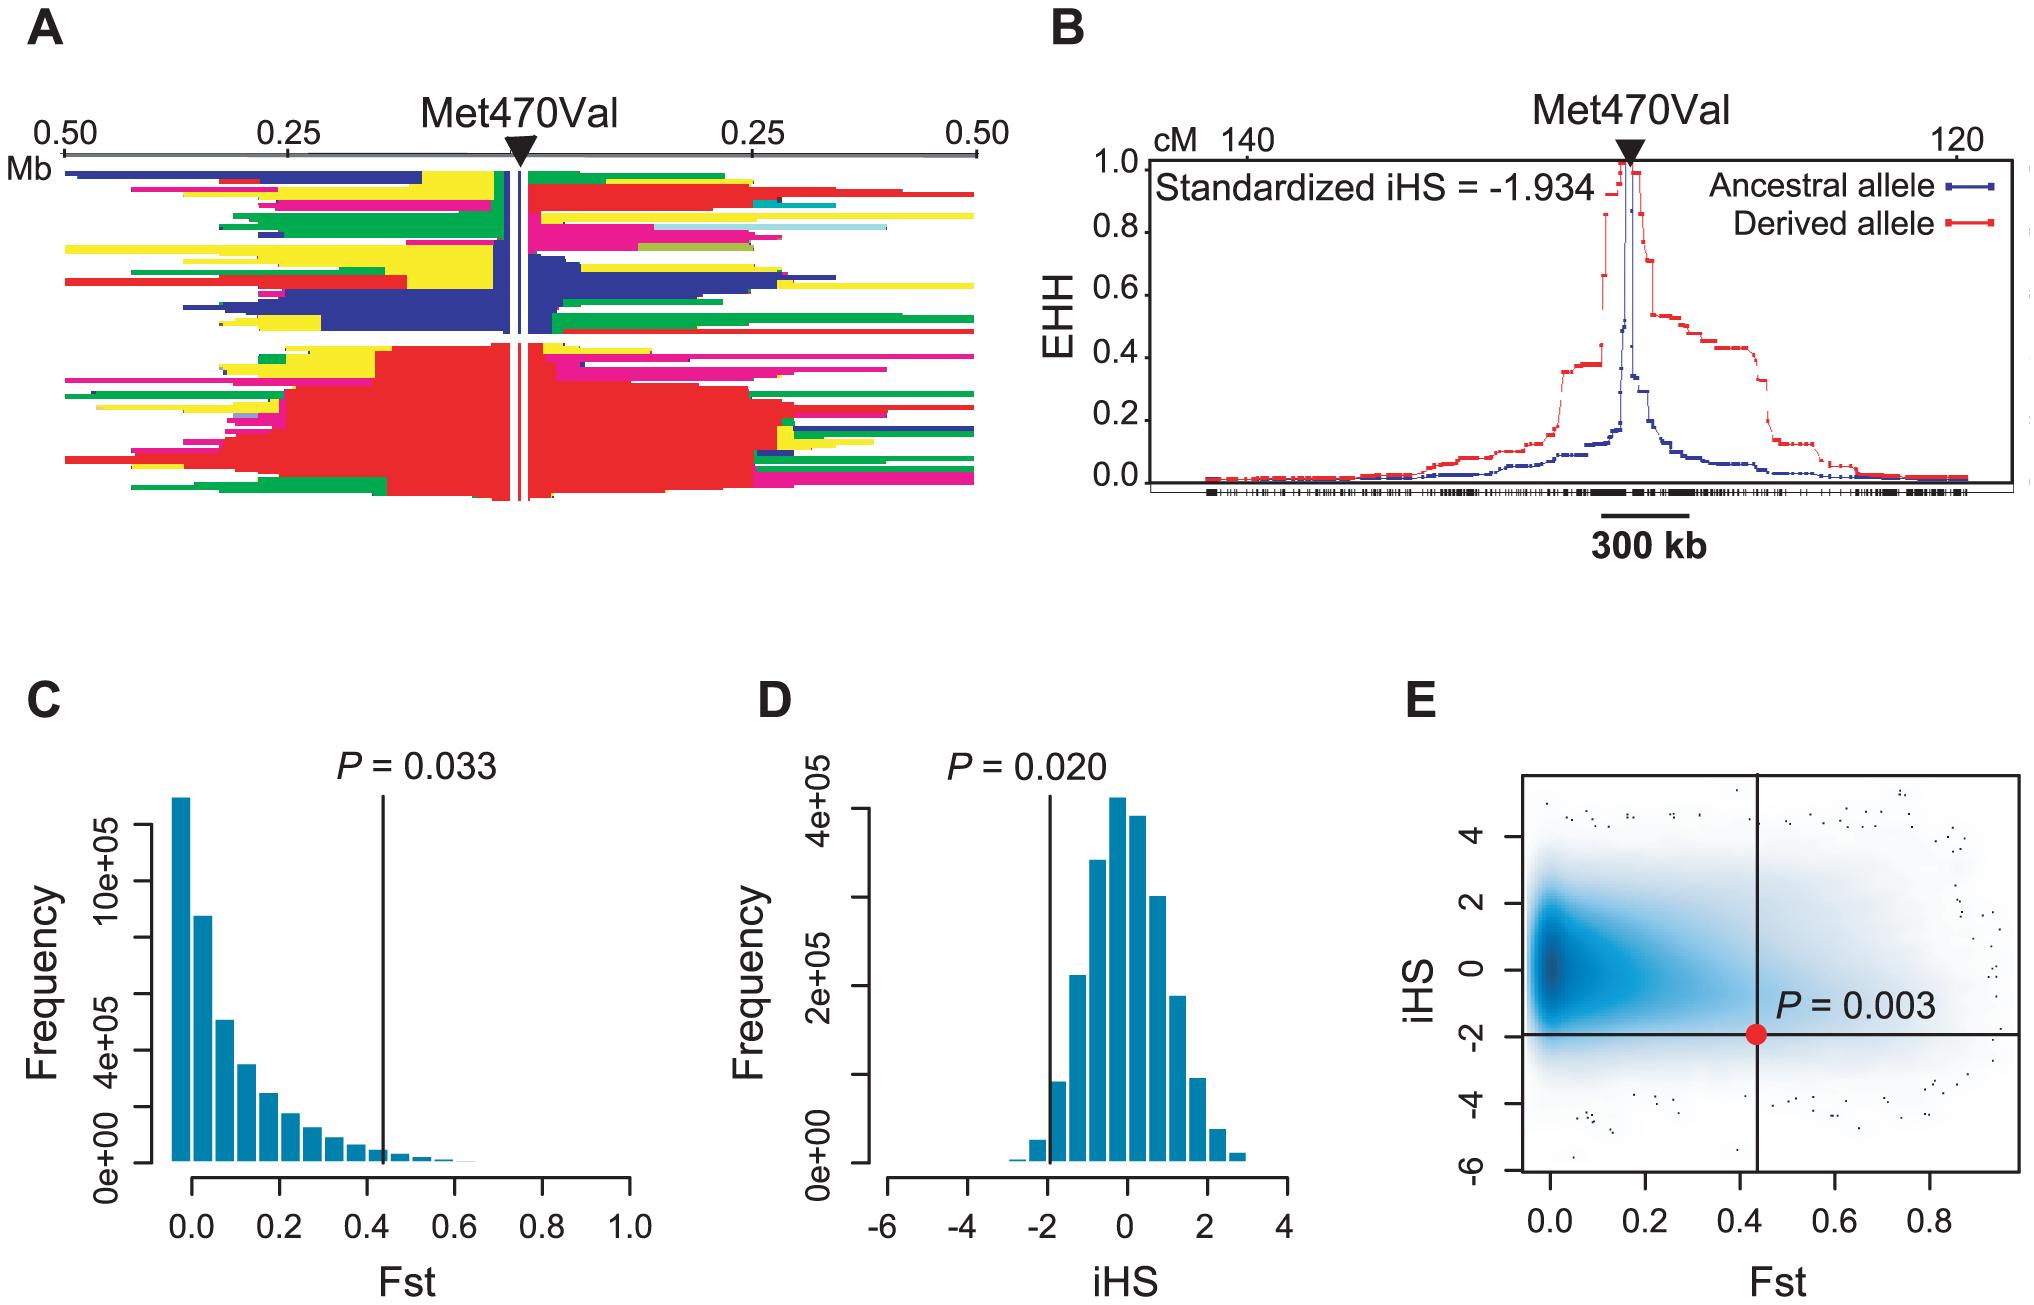 Population genetic parameters of the <i>CFTR</i> Met470Val locus.